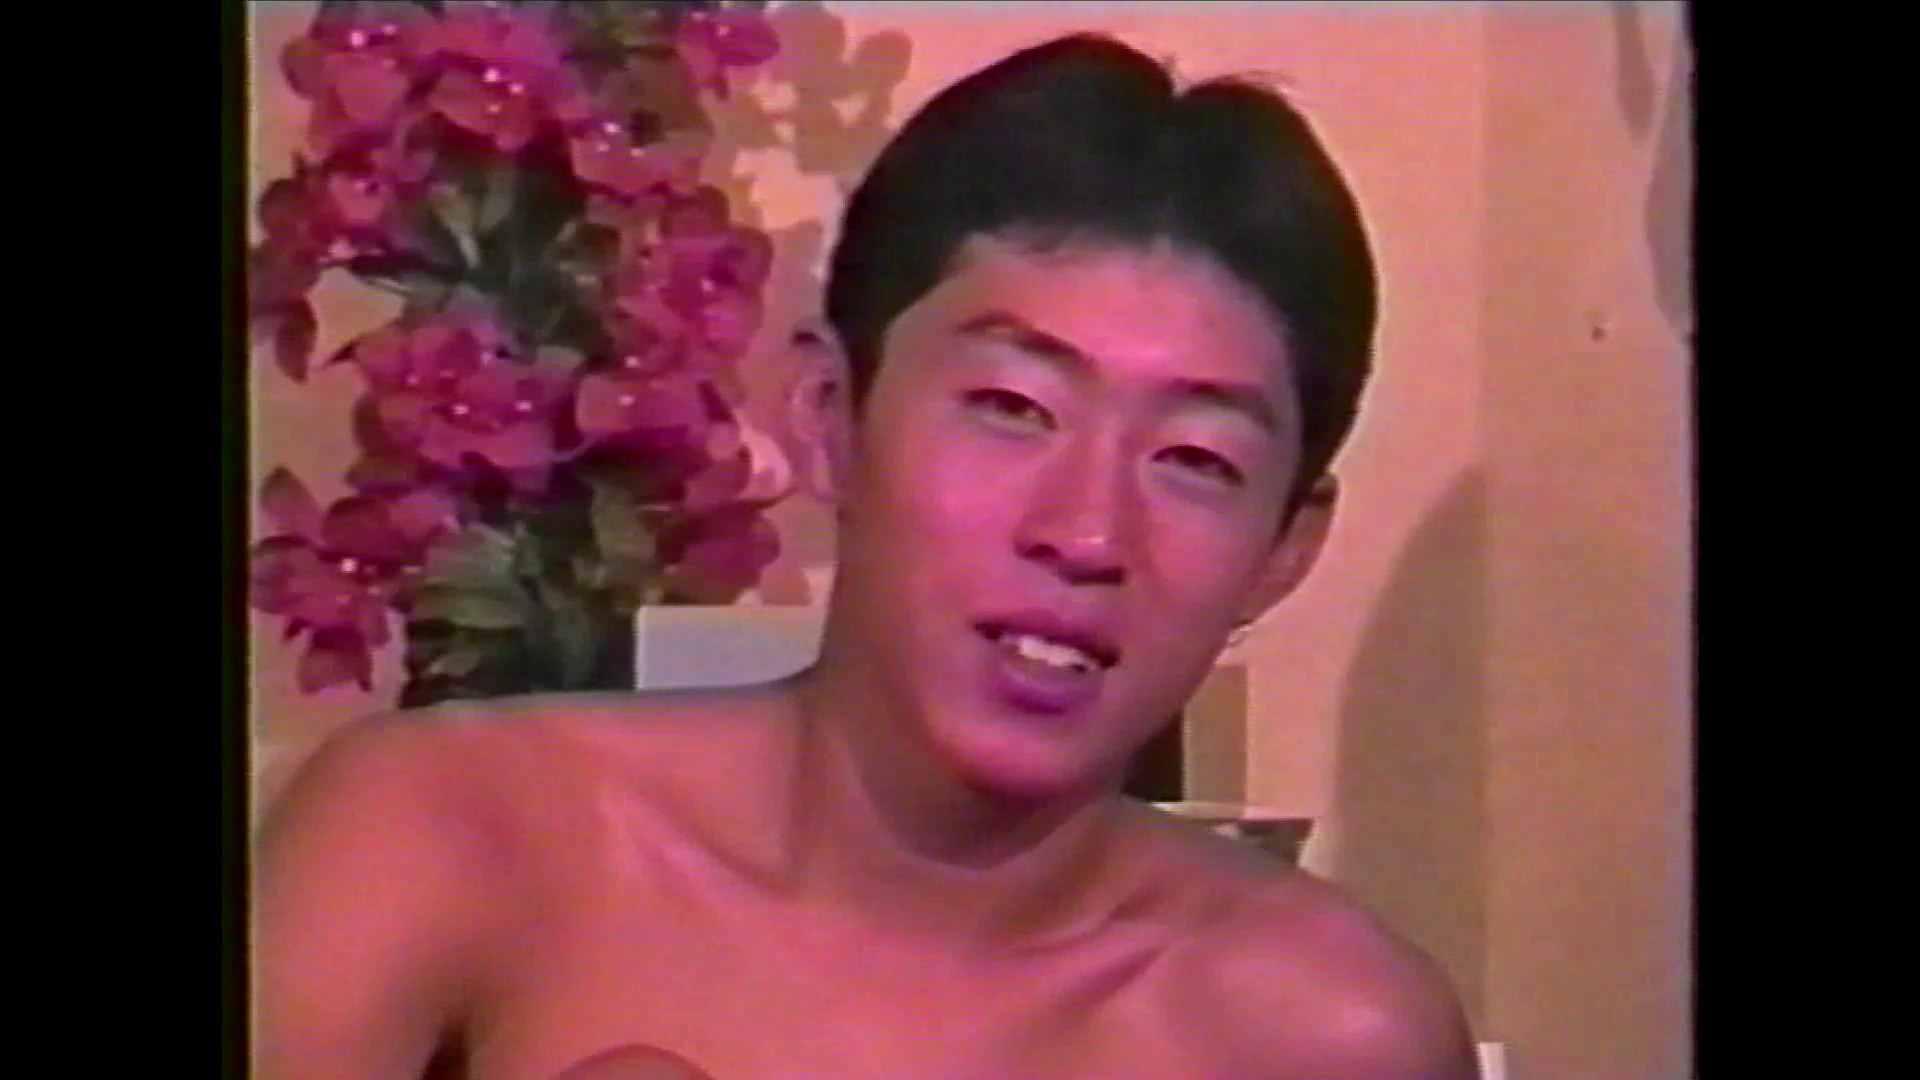 GAYBOY宏のオカズ倉庫Vol.12-2 ディープキス ゲイエロビデオ画像 99枚 18